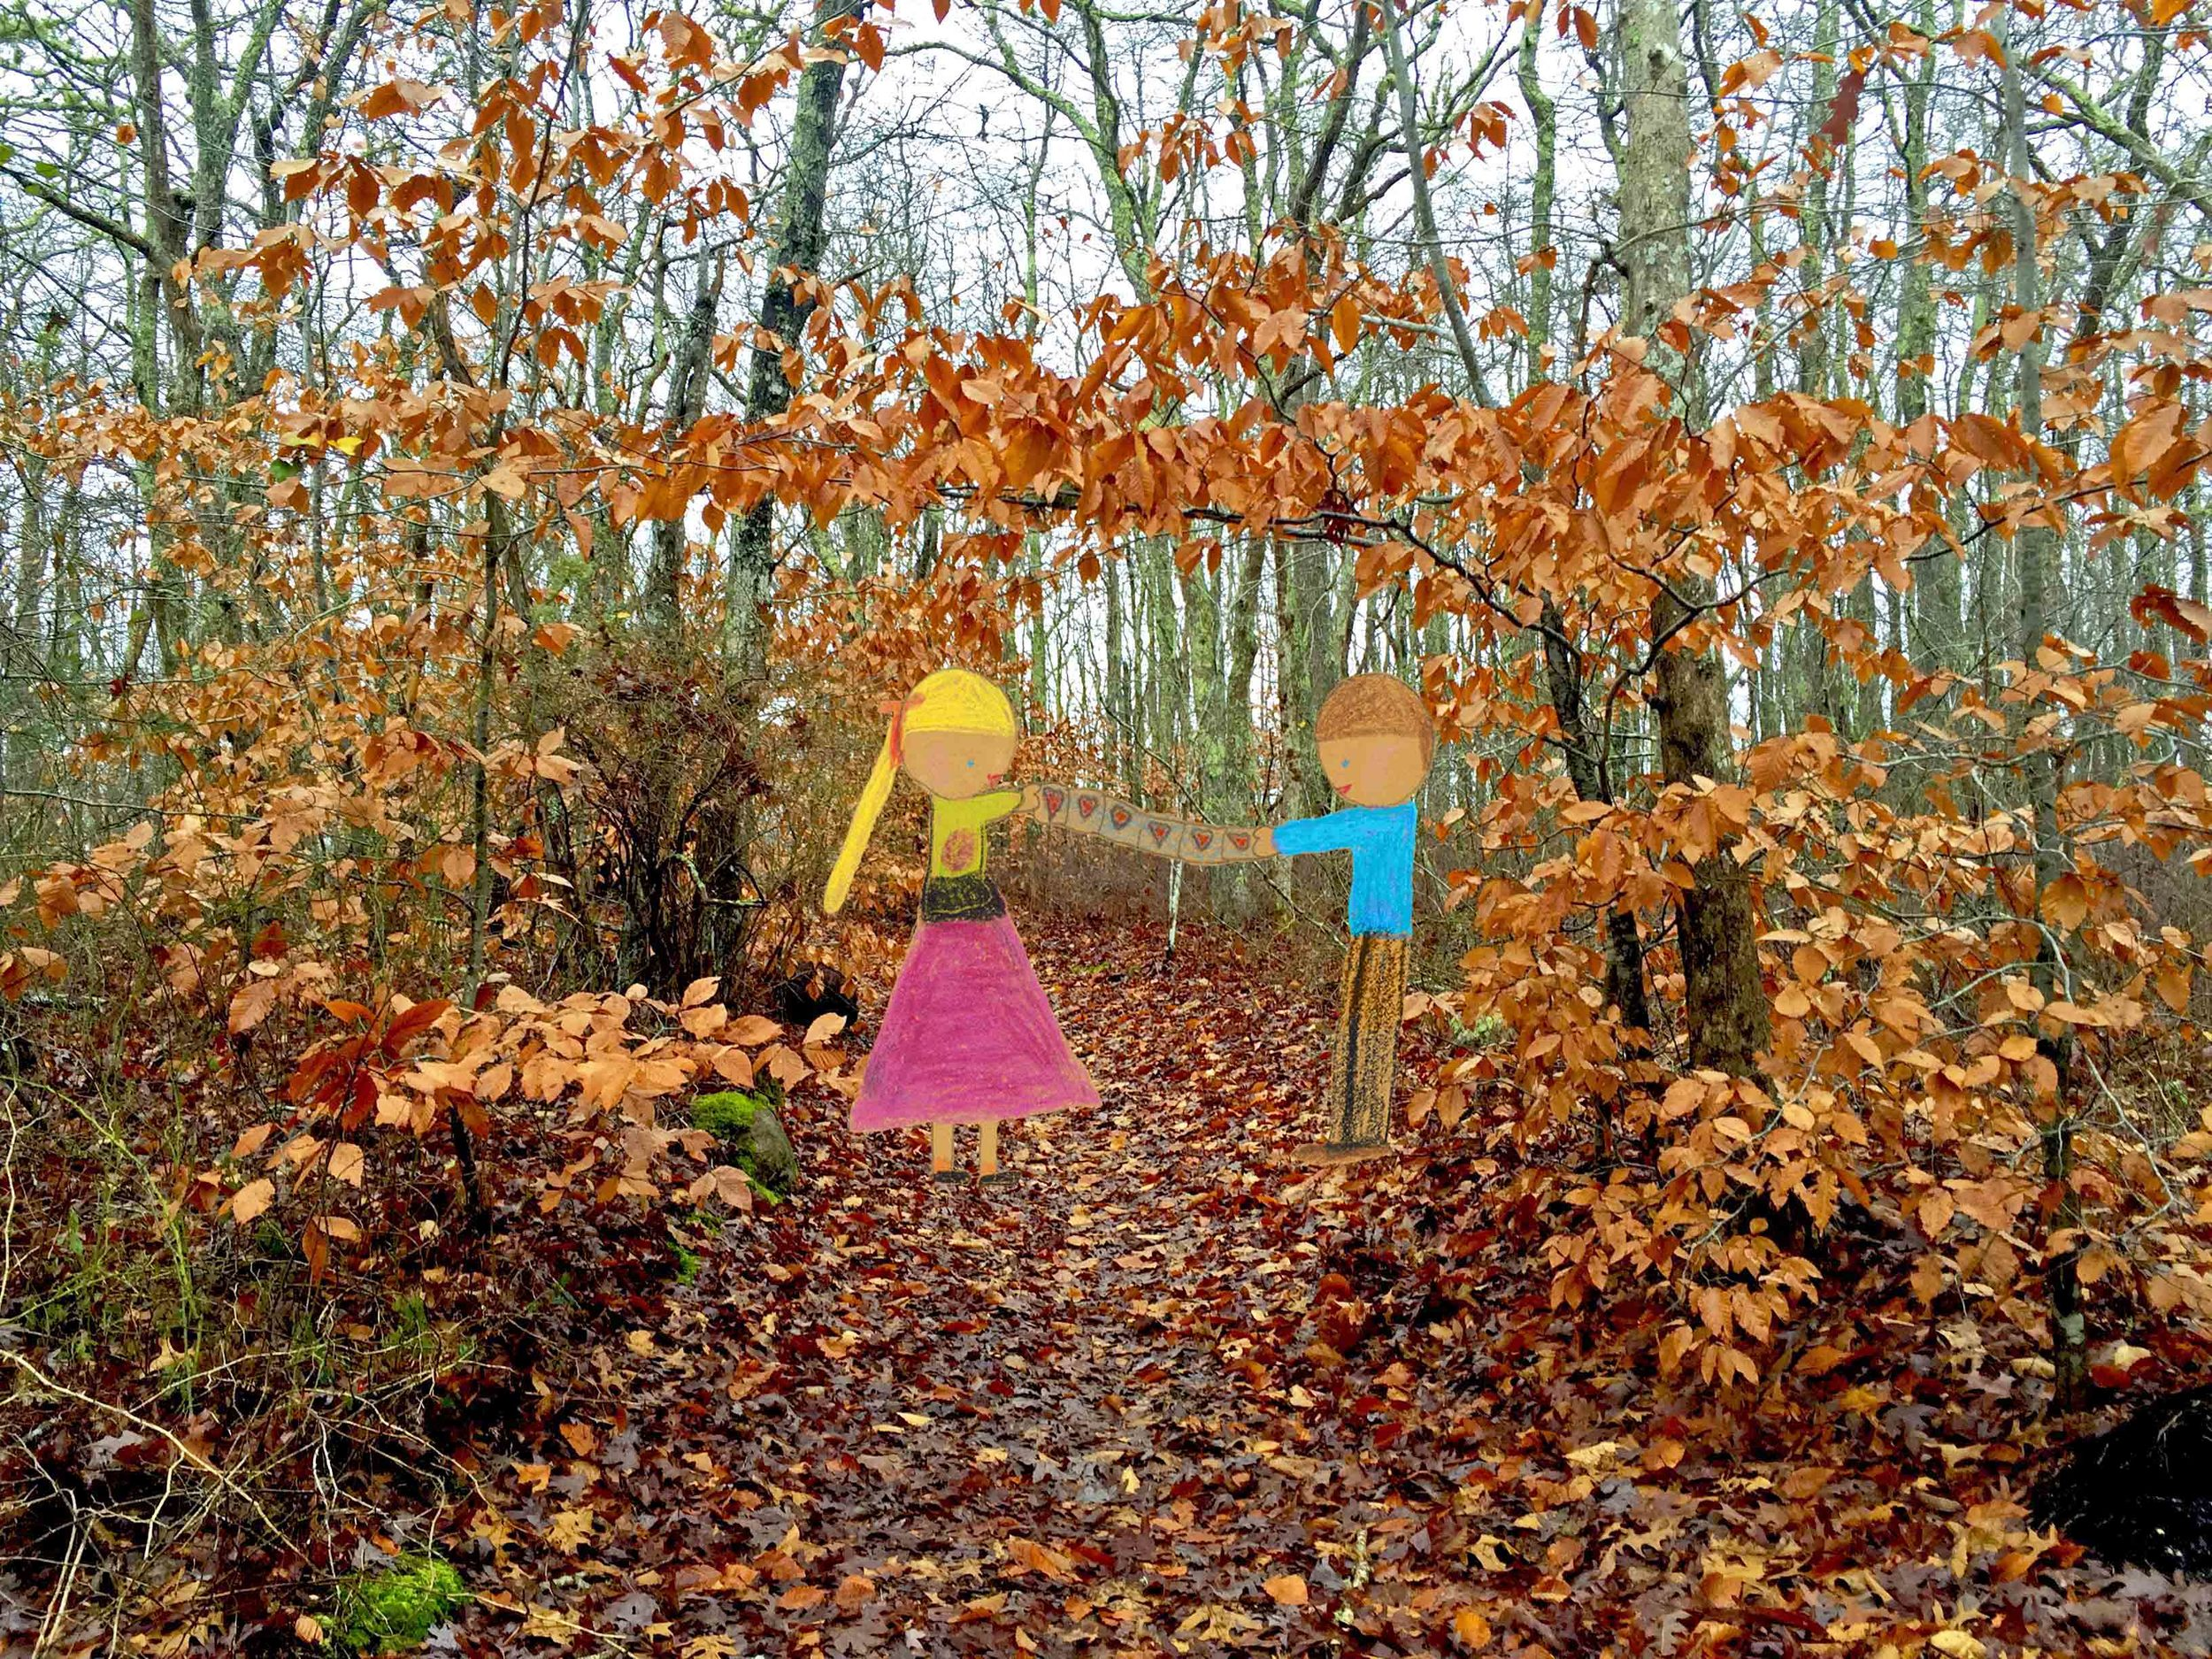 Sherriff's Meadow Couple